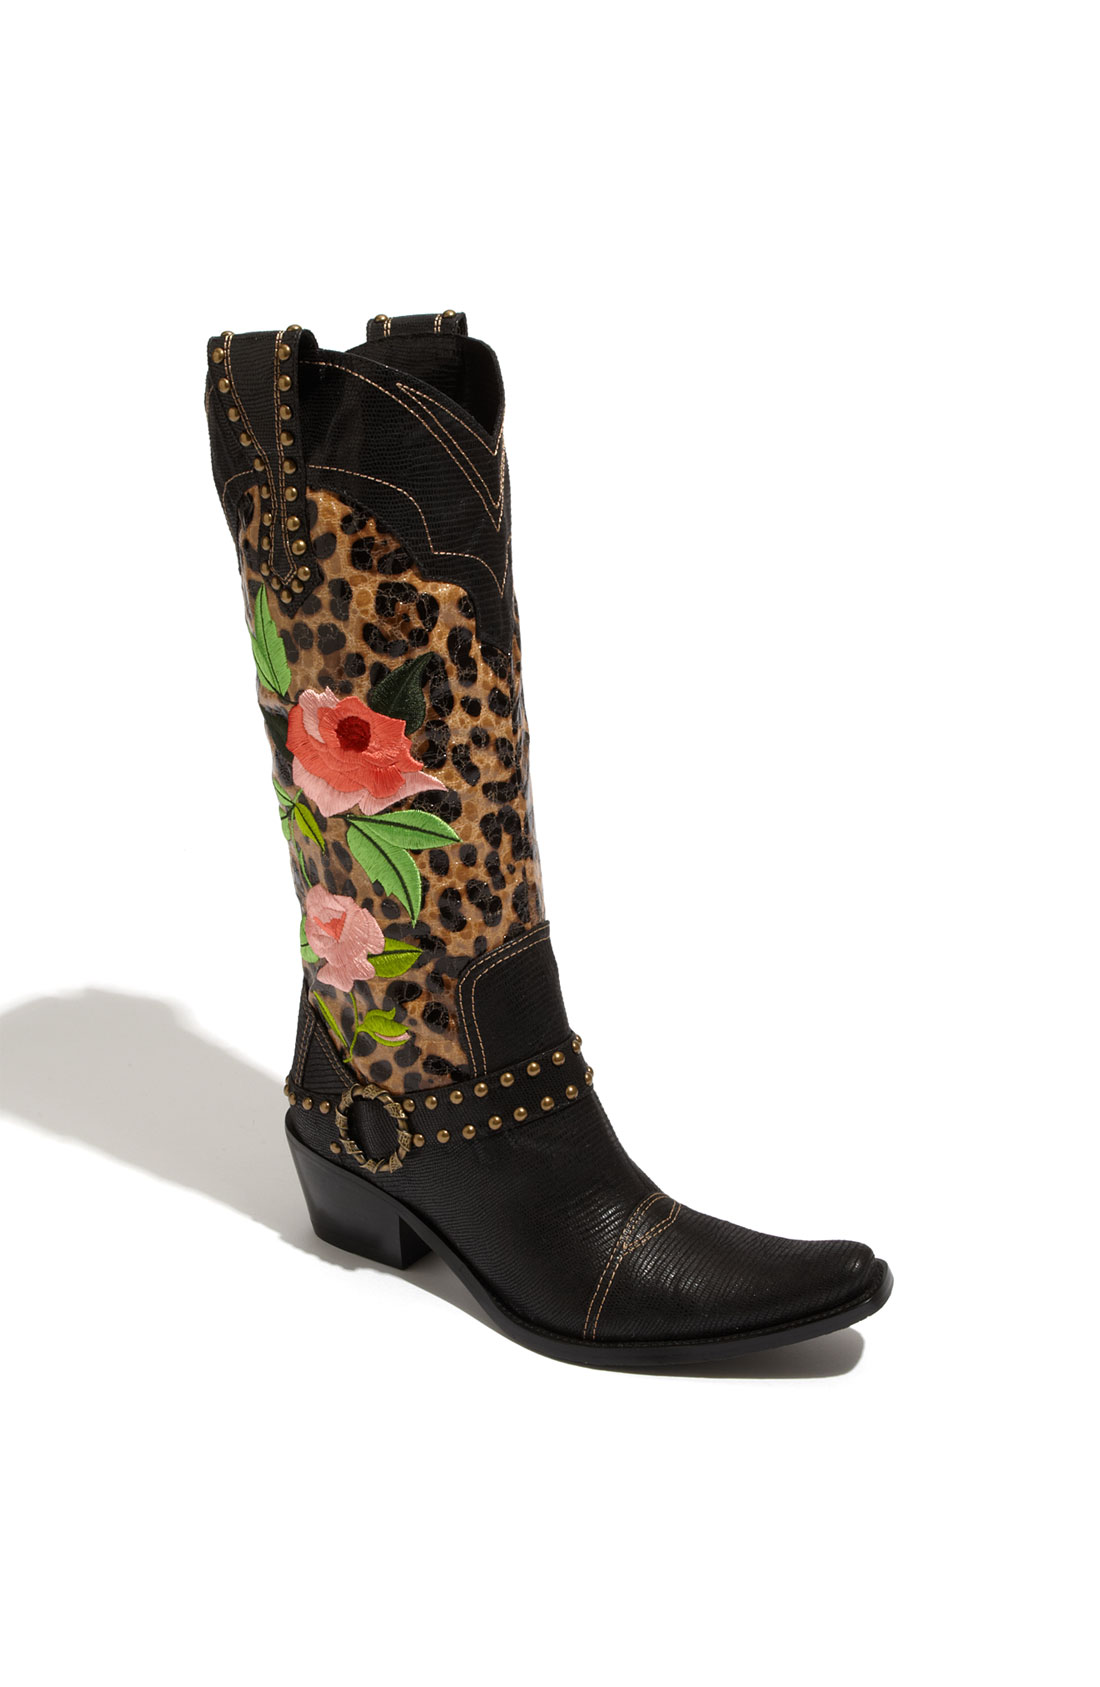 j rene 233 dakota boot in black leopard black lyst